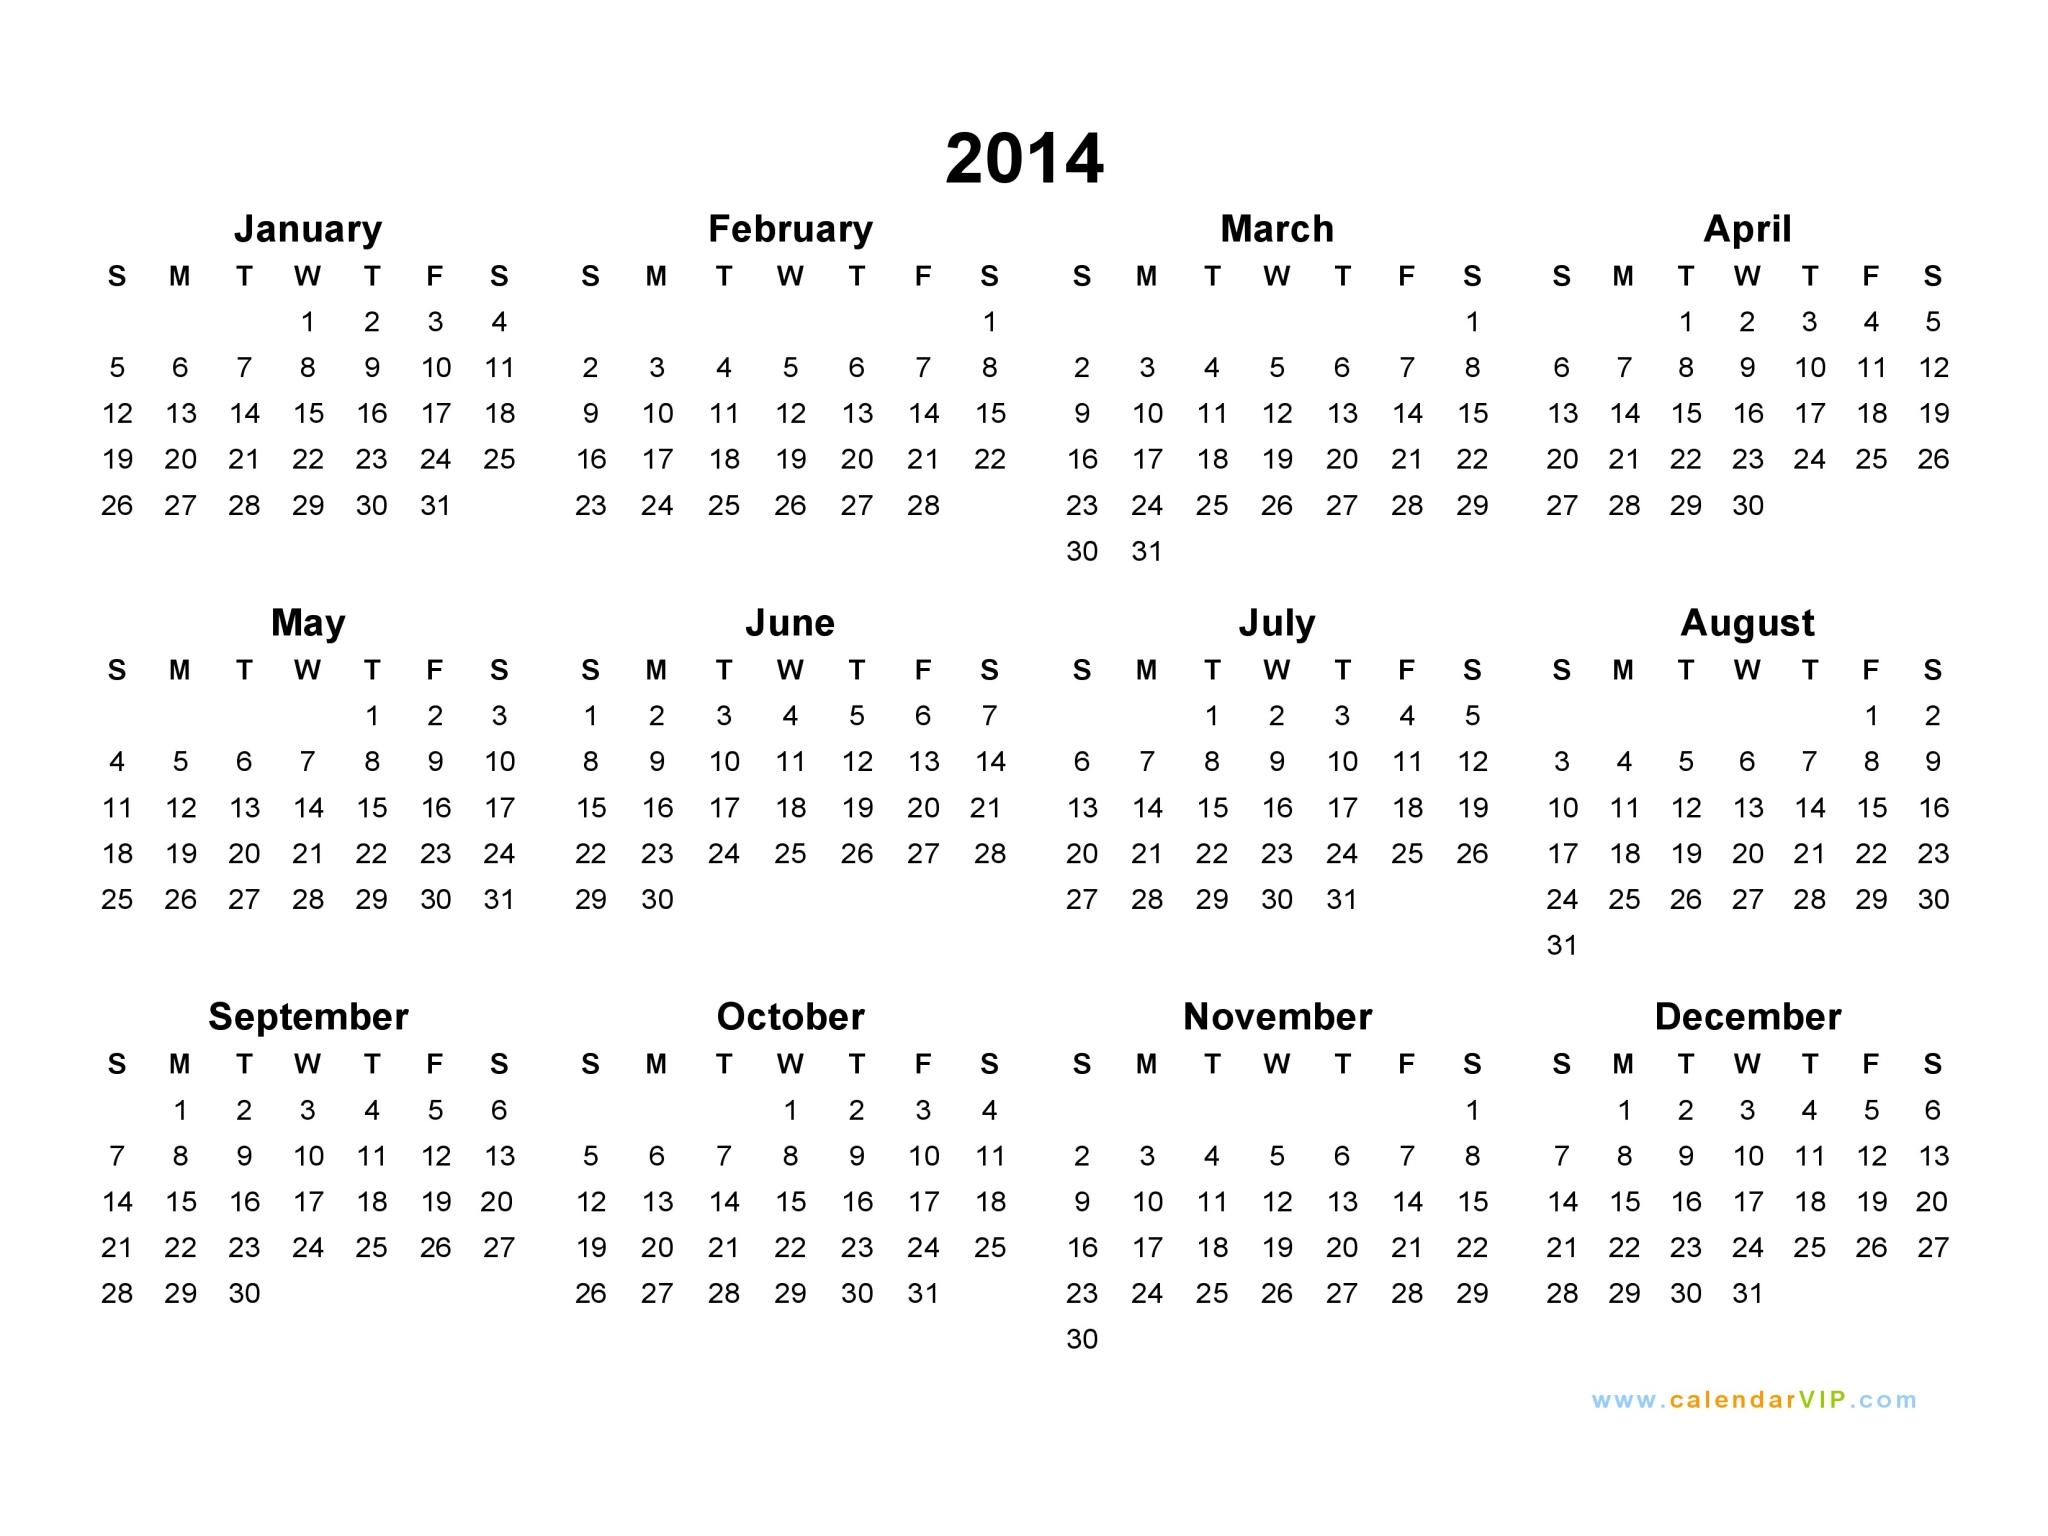 2014 Calendar  Blank Printable Calendar Template In Pdf intended for Blank Calendar 2014